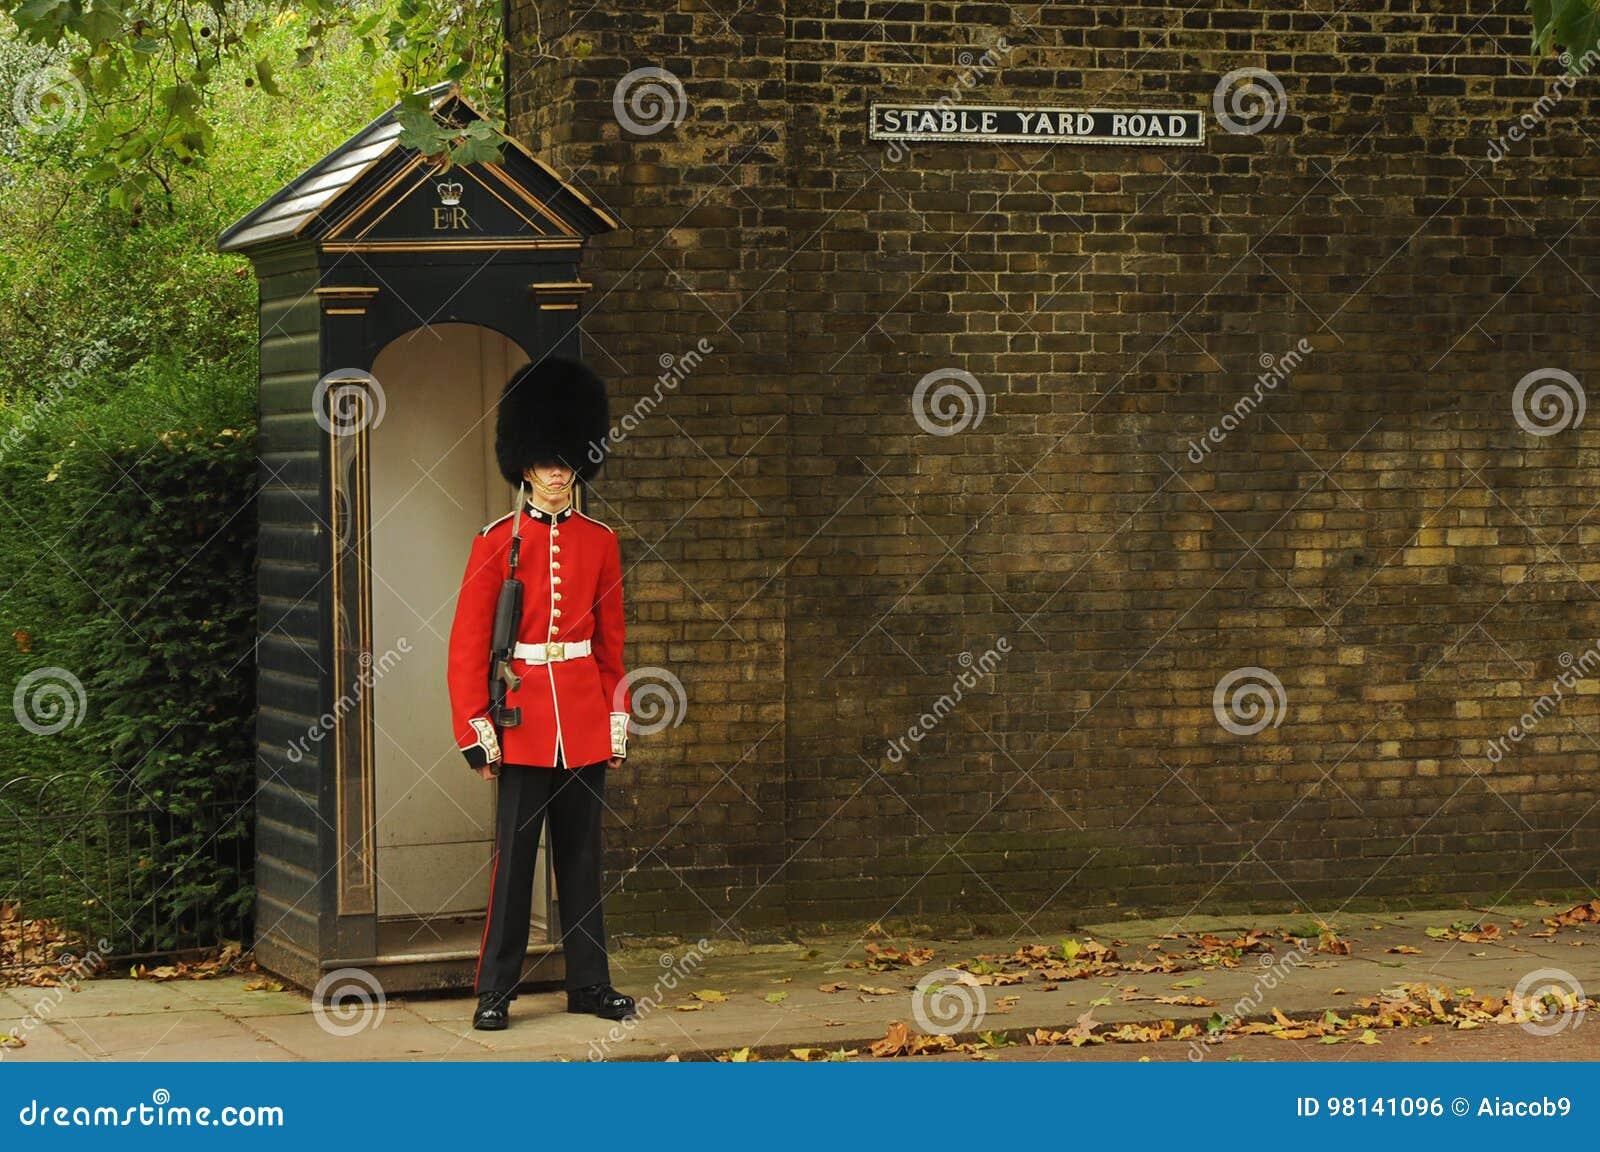 Buckingham Palace, Londres central, Reino Unido - 30 de setembro de 2012